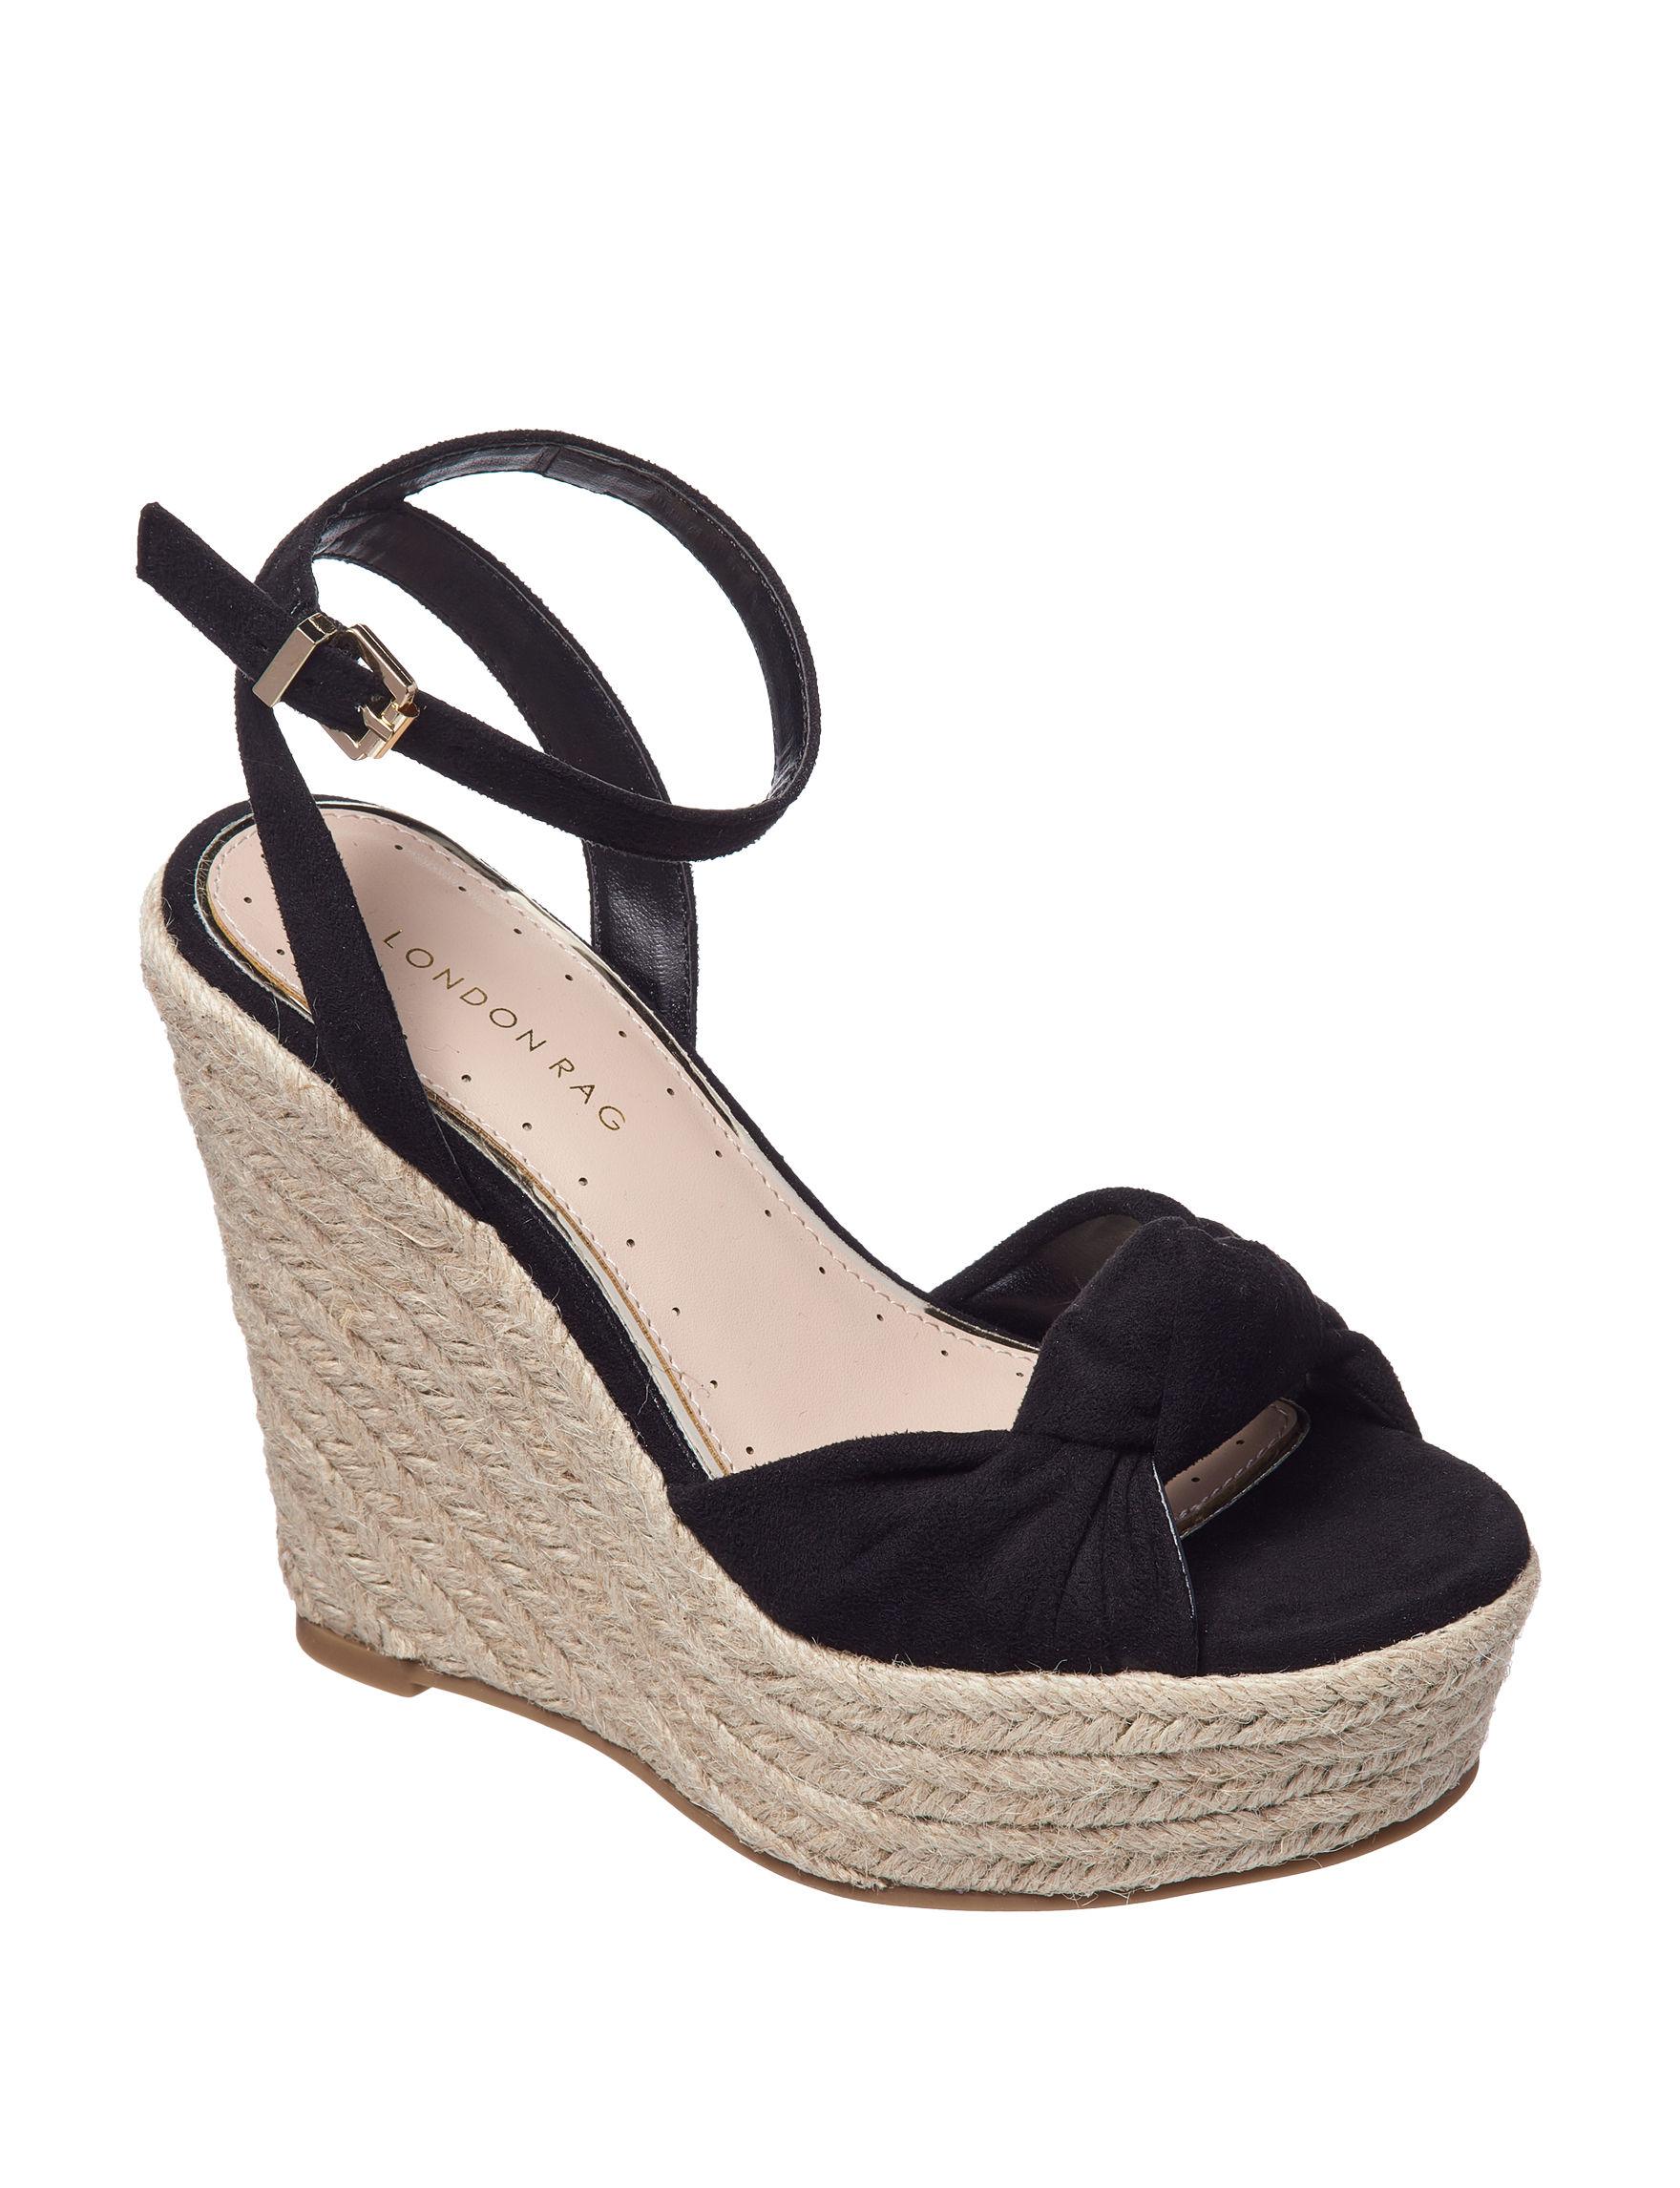 London Rag Black Wedge Sandals